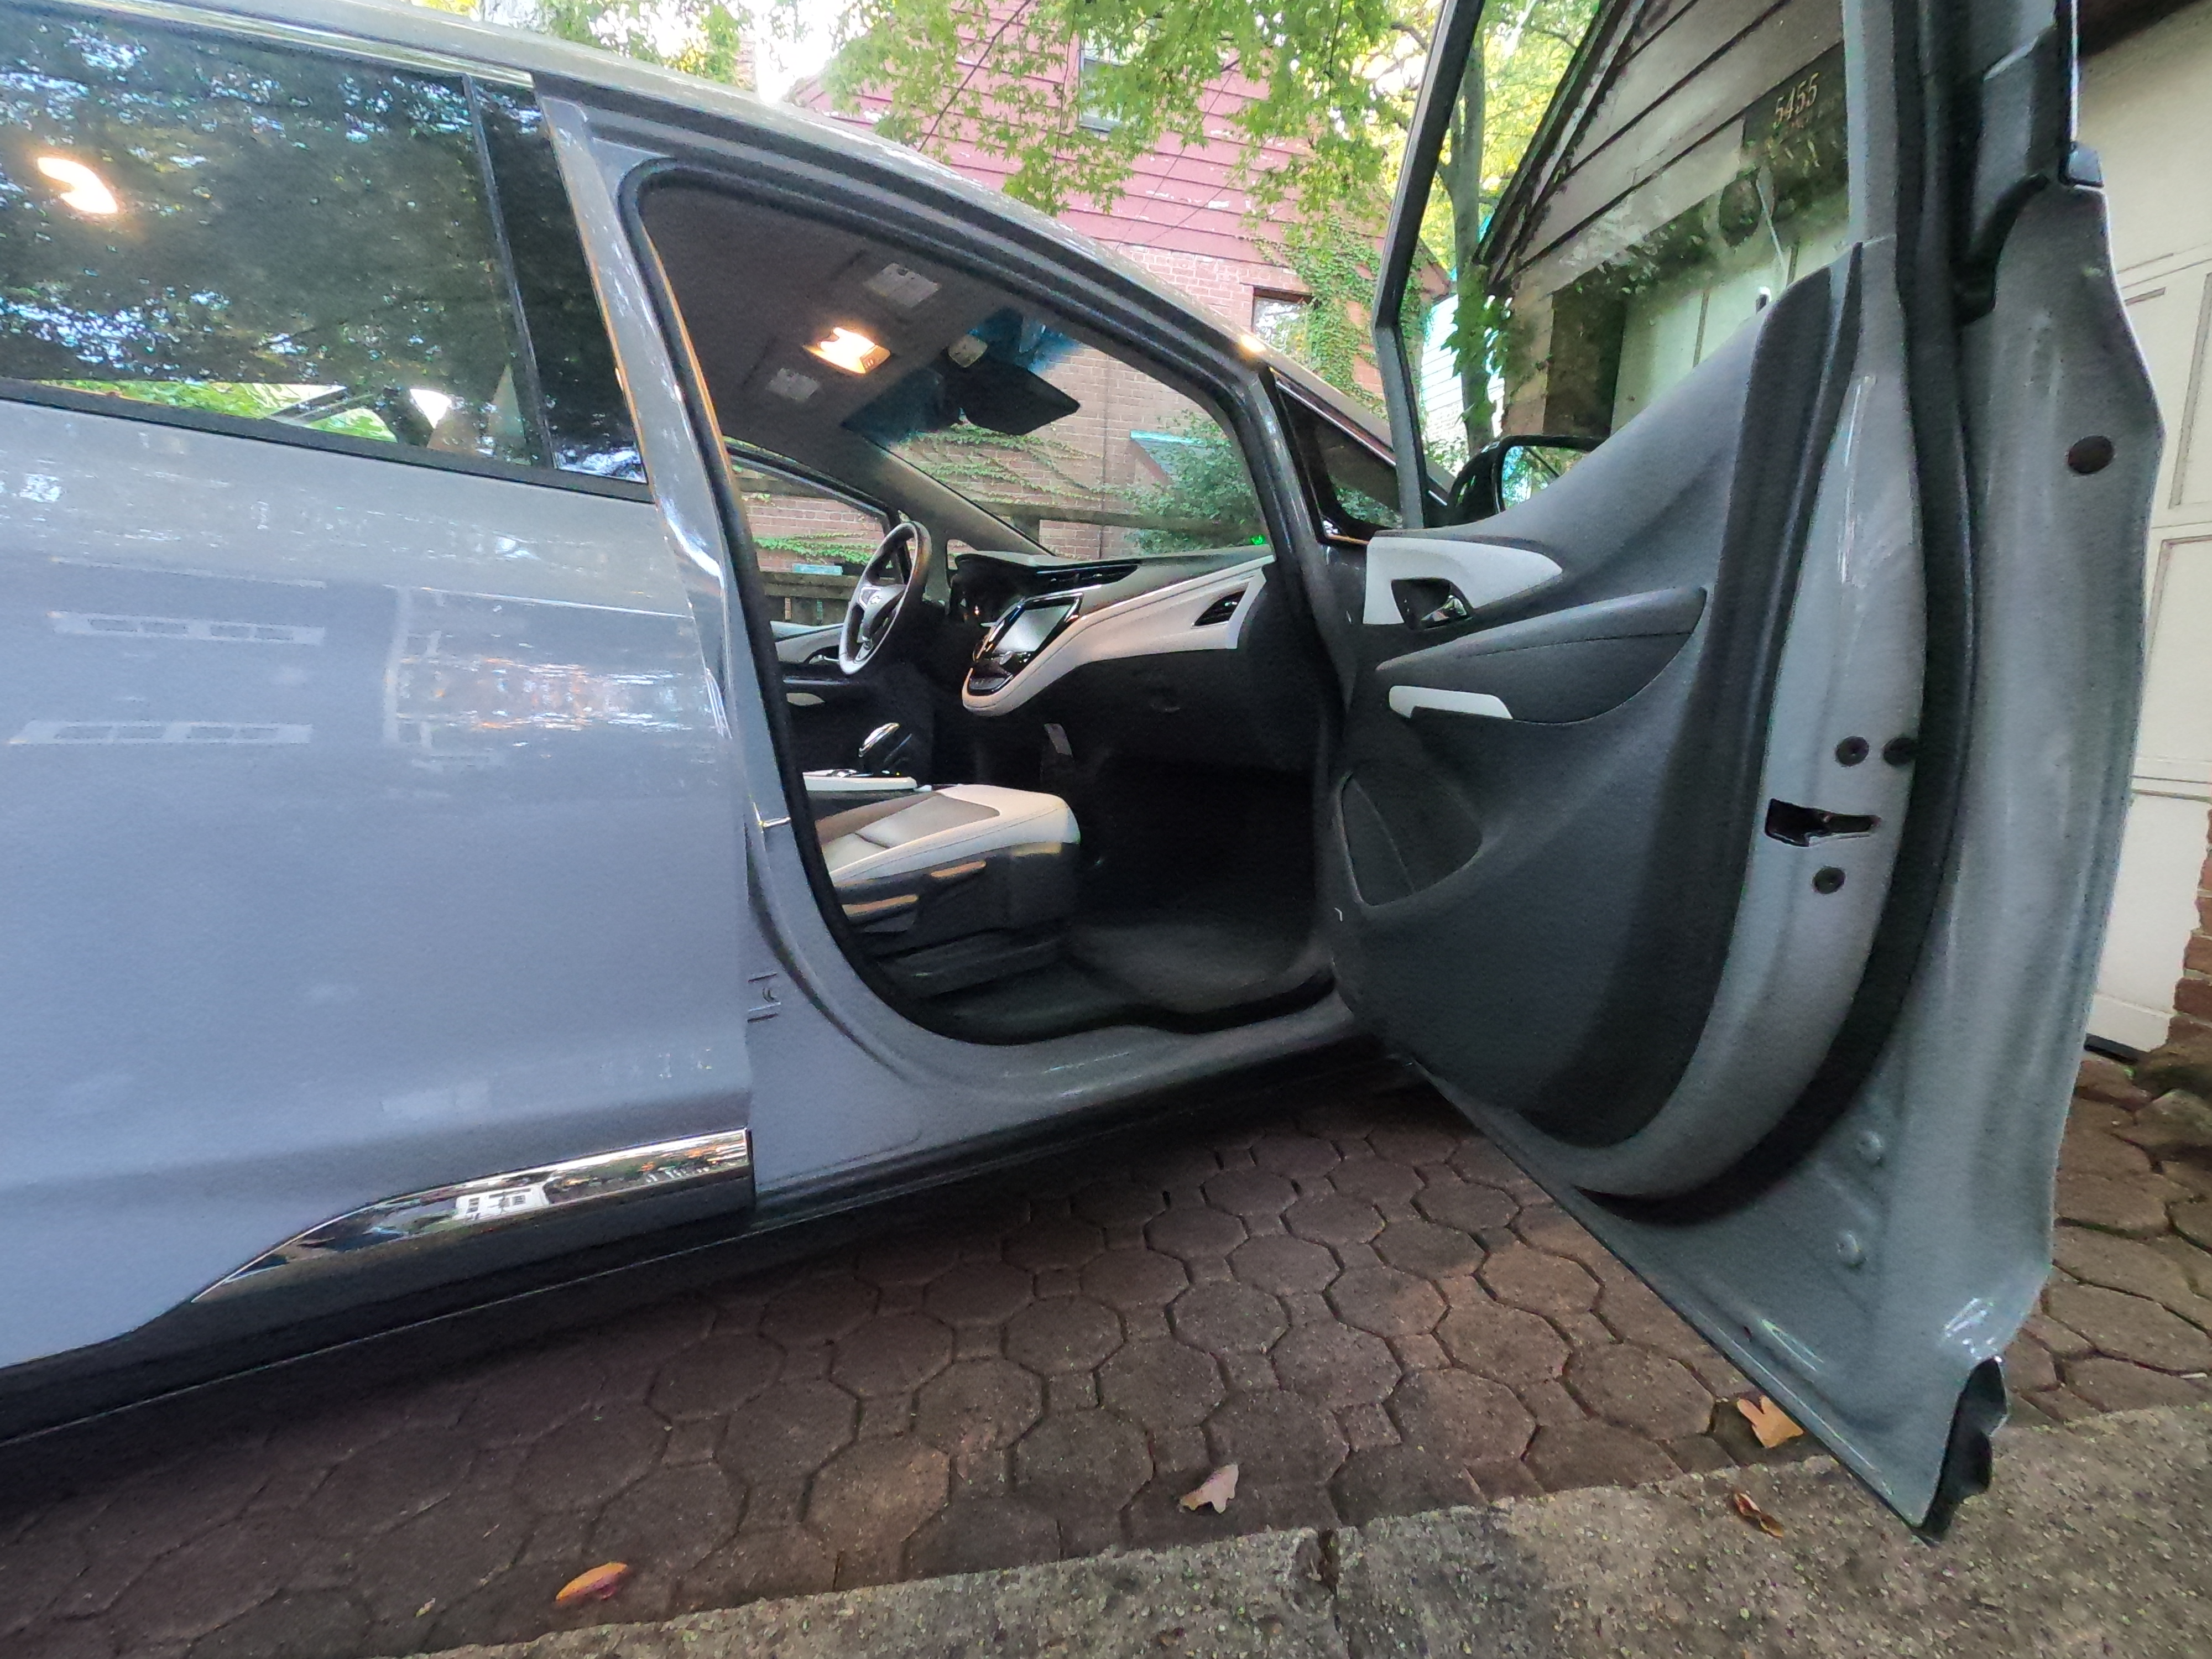 Chevrolet Bolt EV right door open looking inside